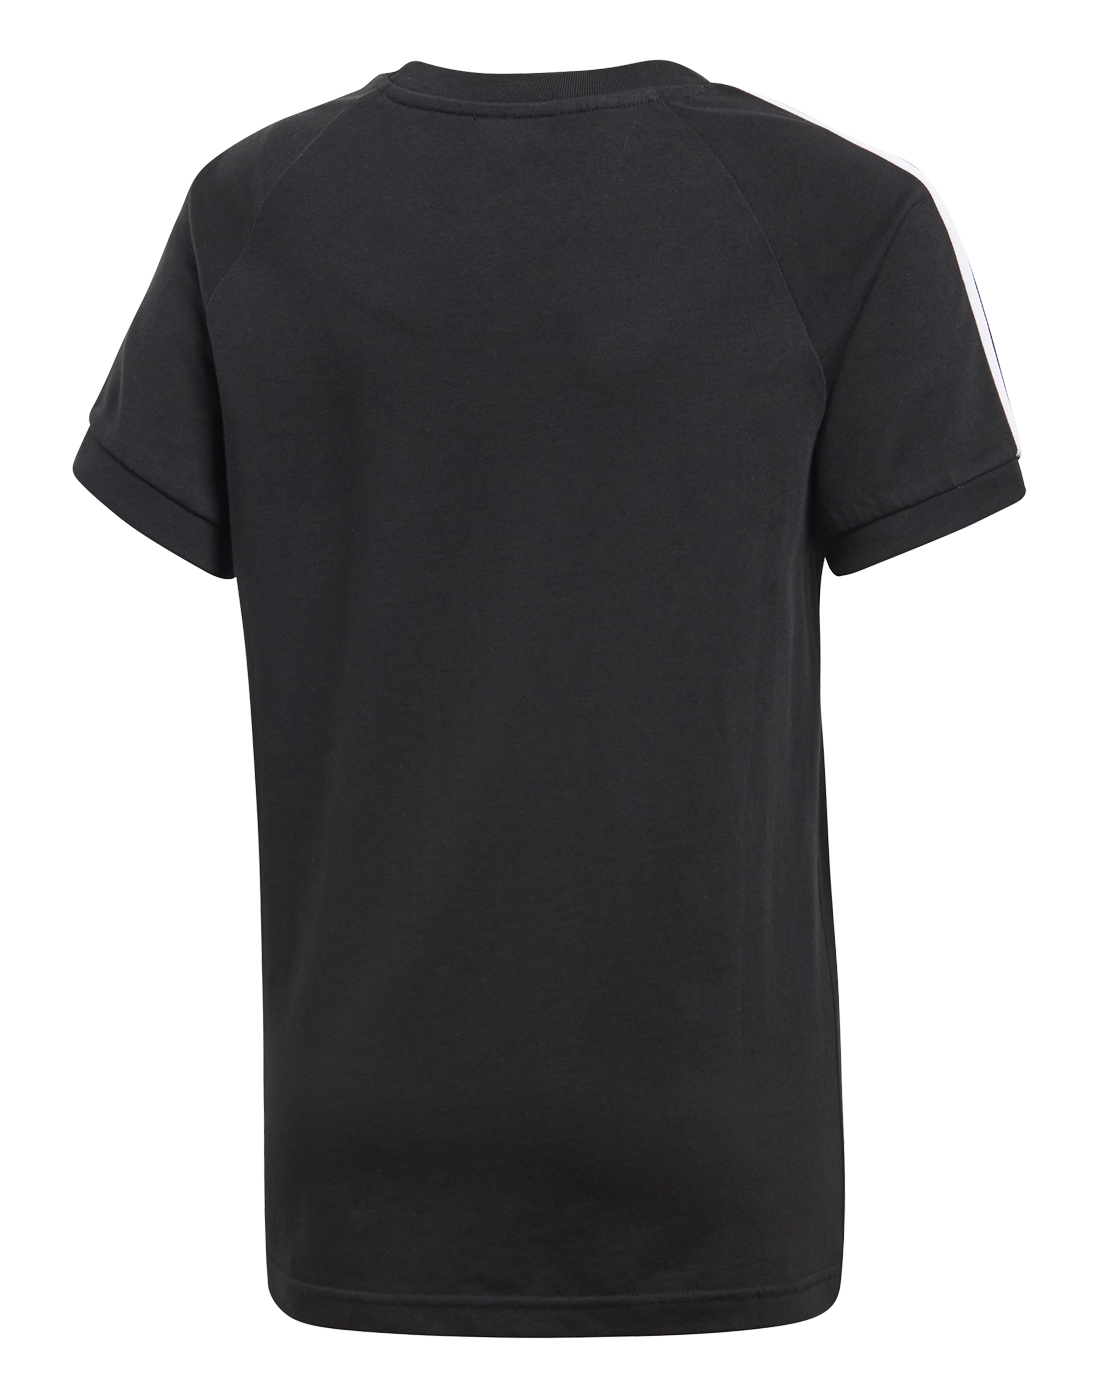 buy popular cfa61 dd1ca ... Older Kids California T-Shirt